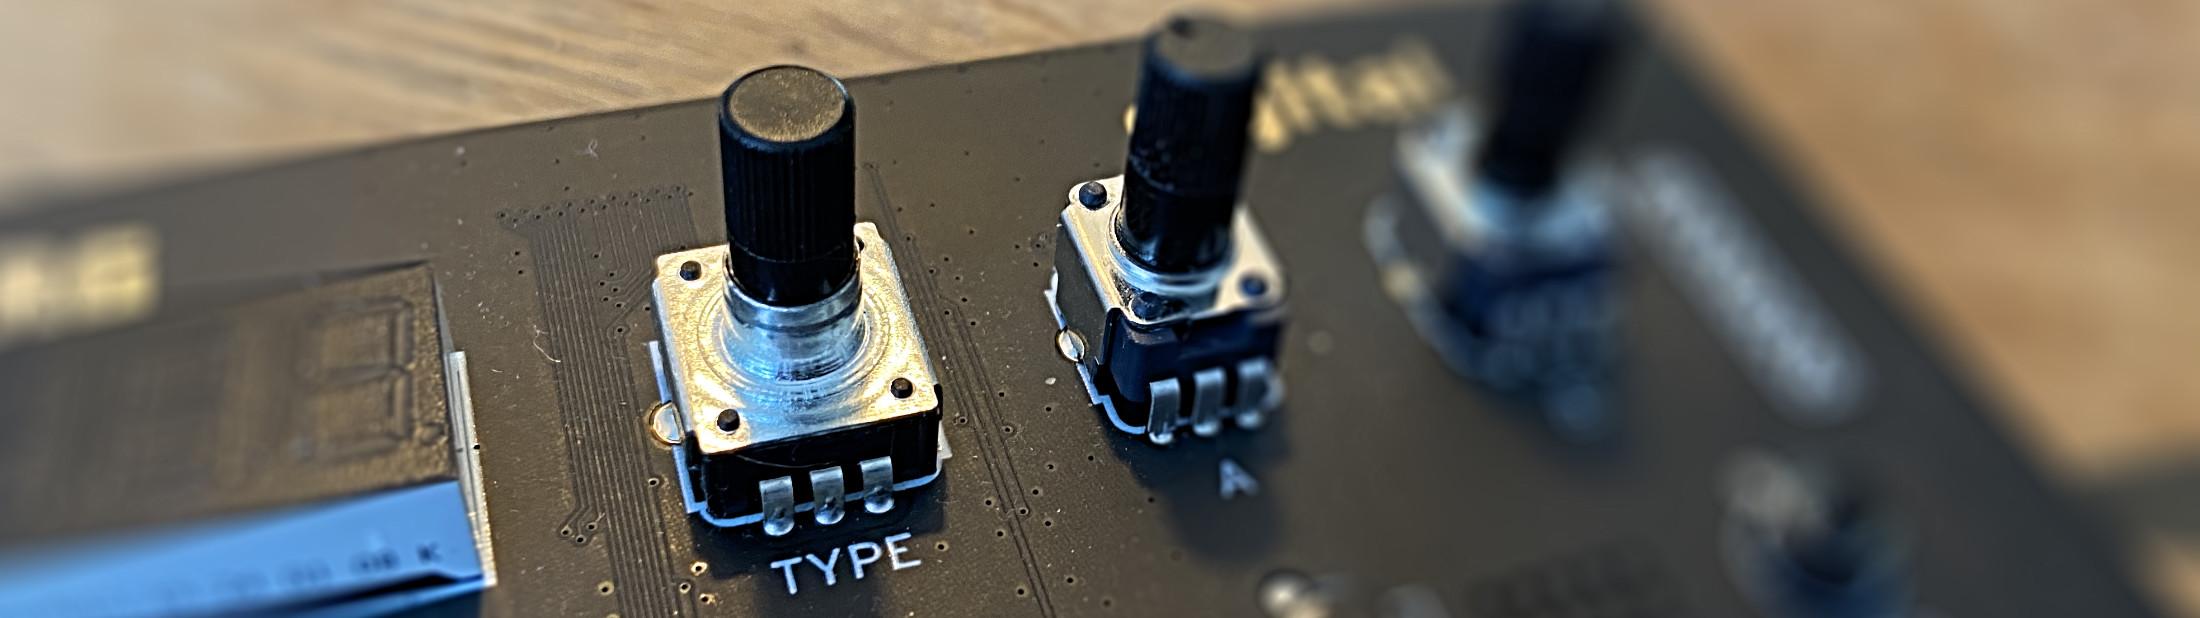 nts1-knobs